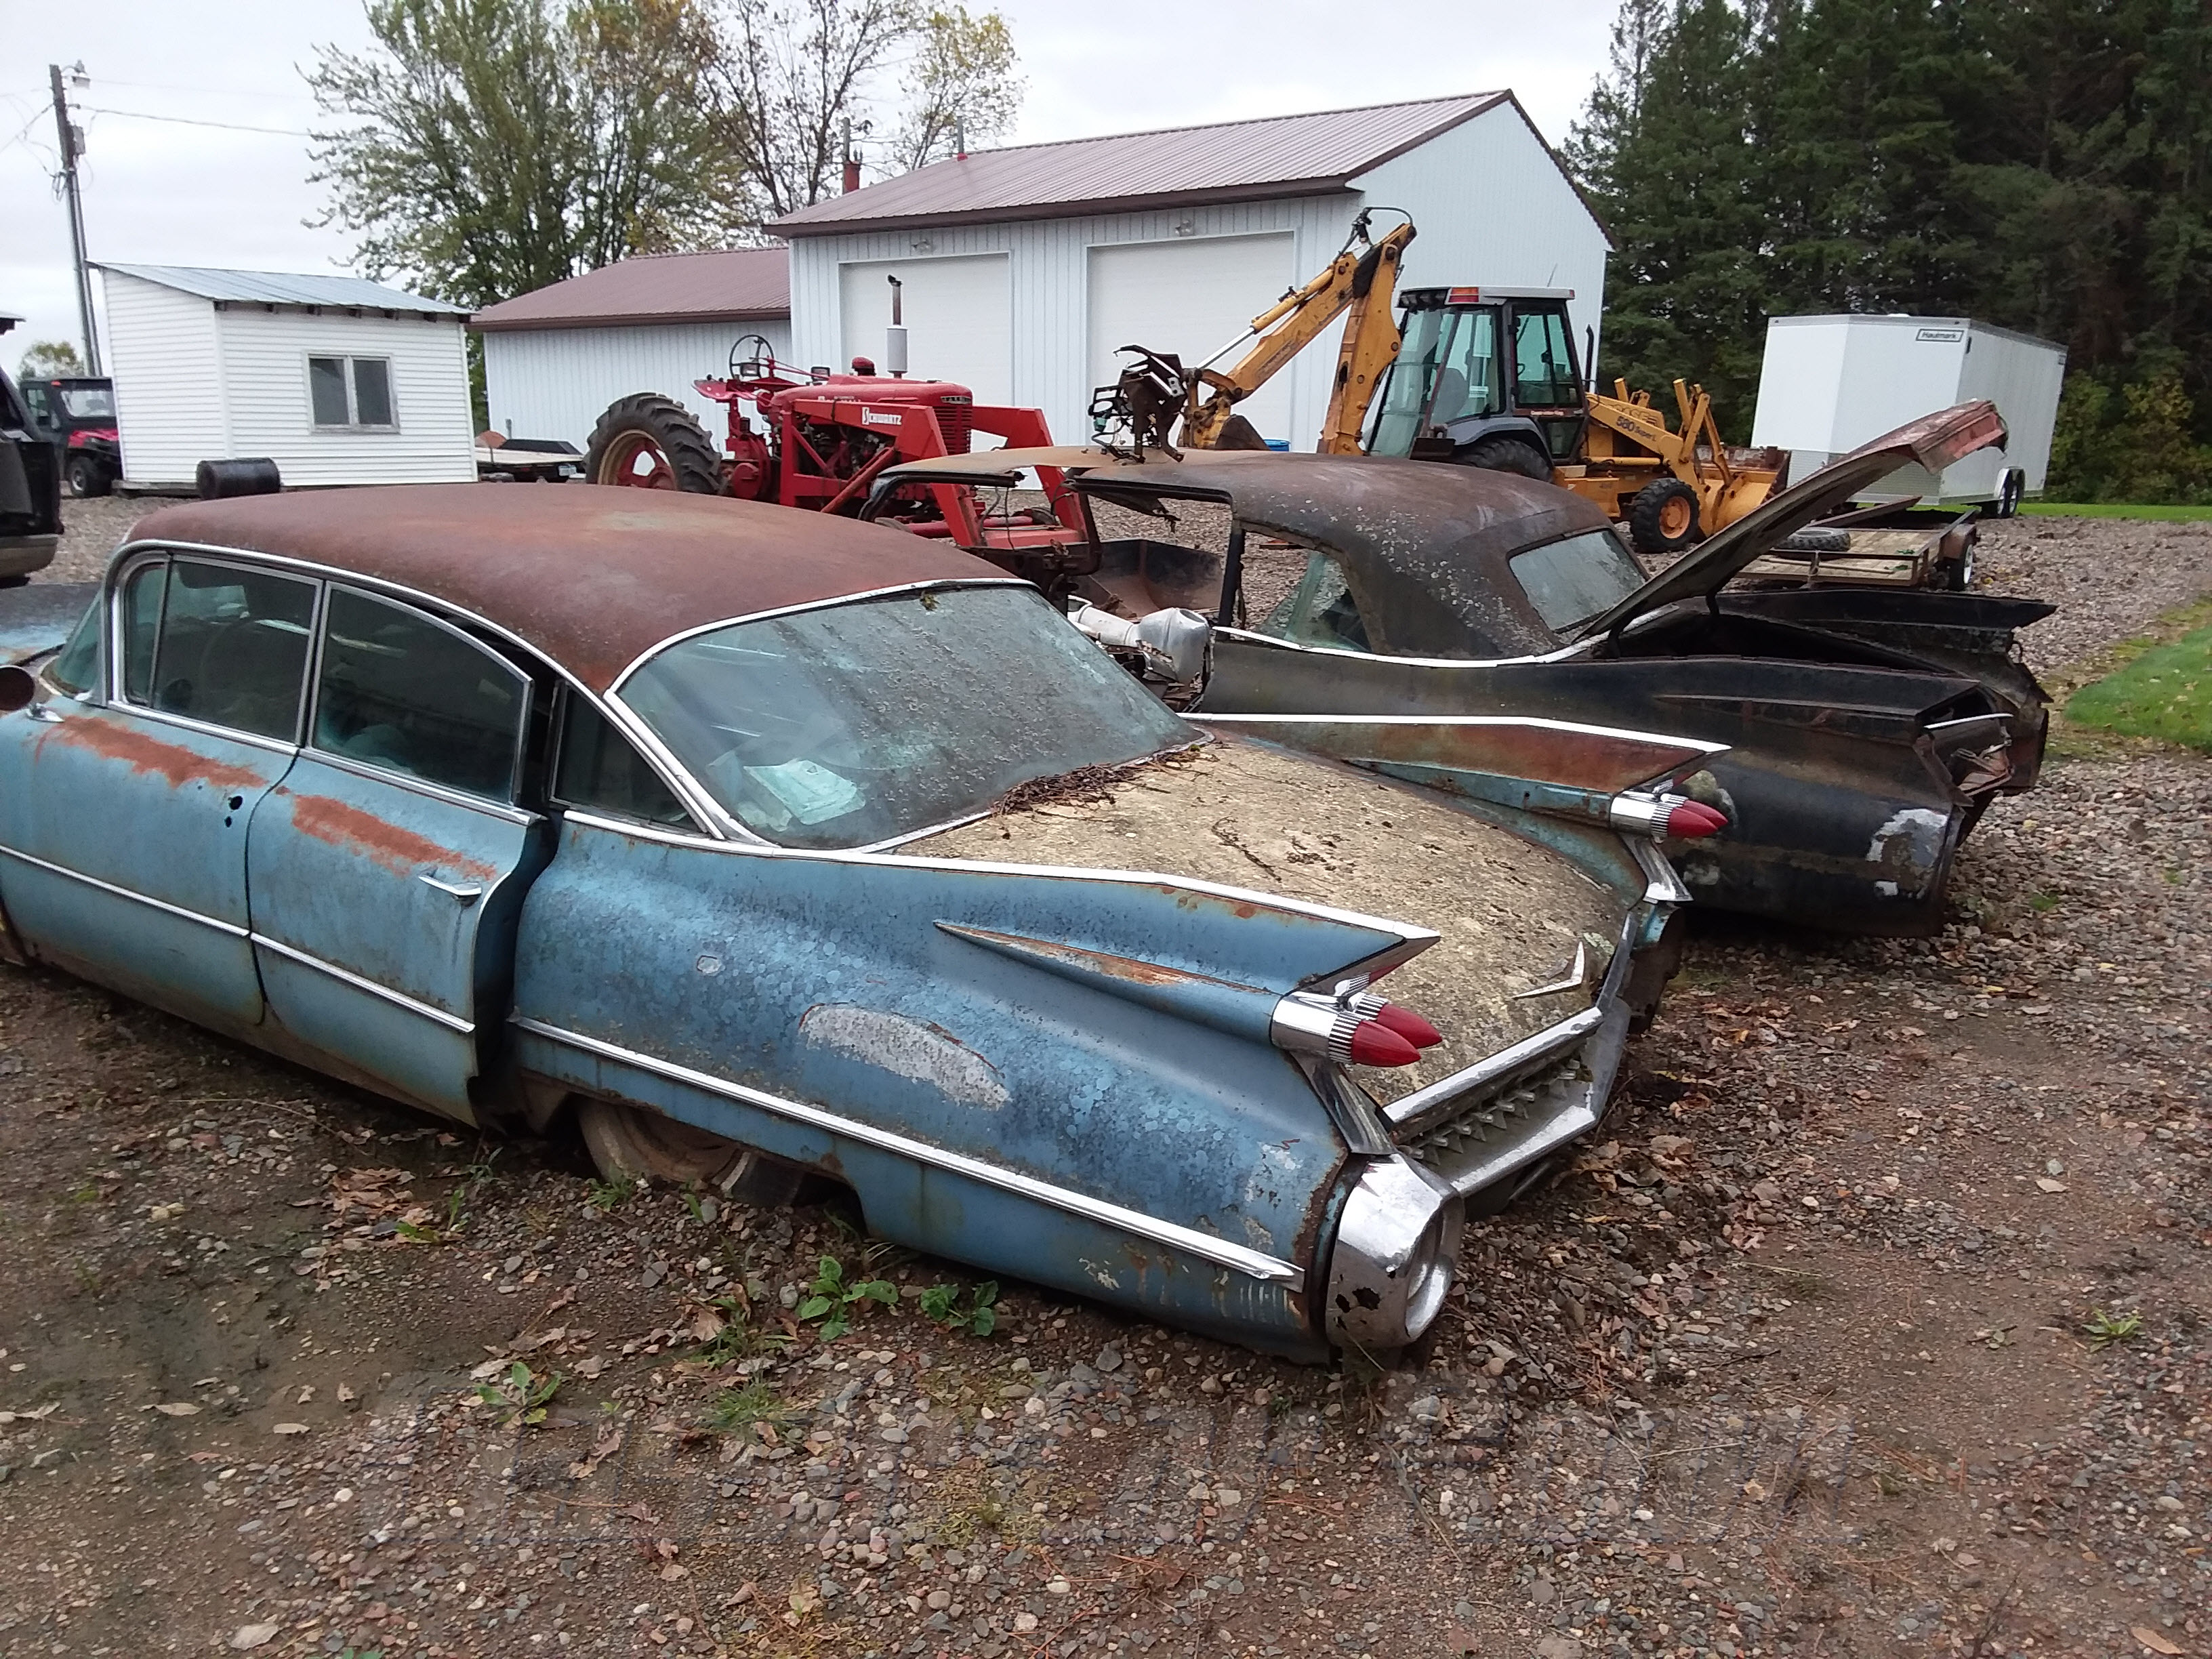 1959 Cadillac Rear (5)